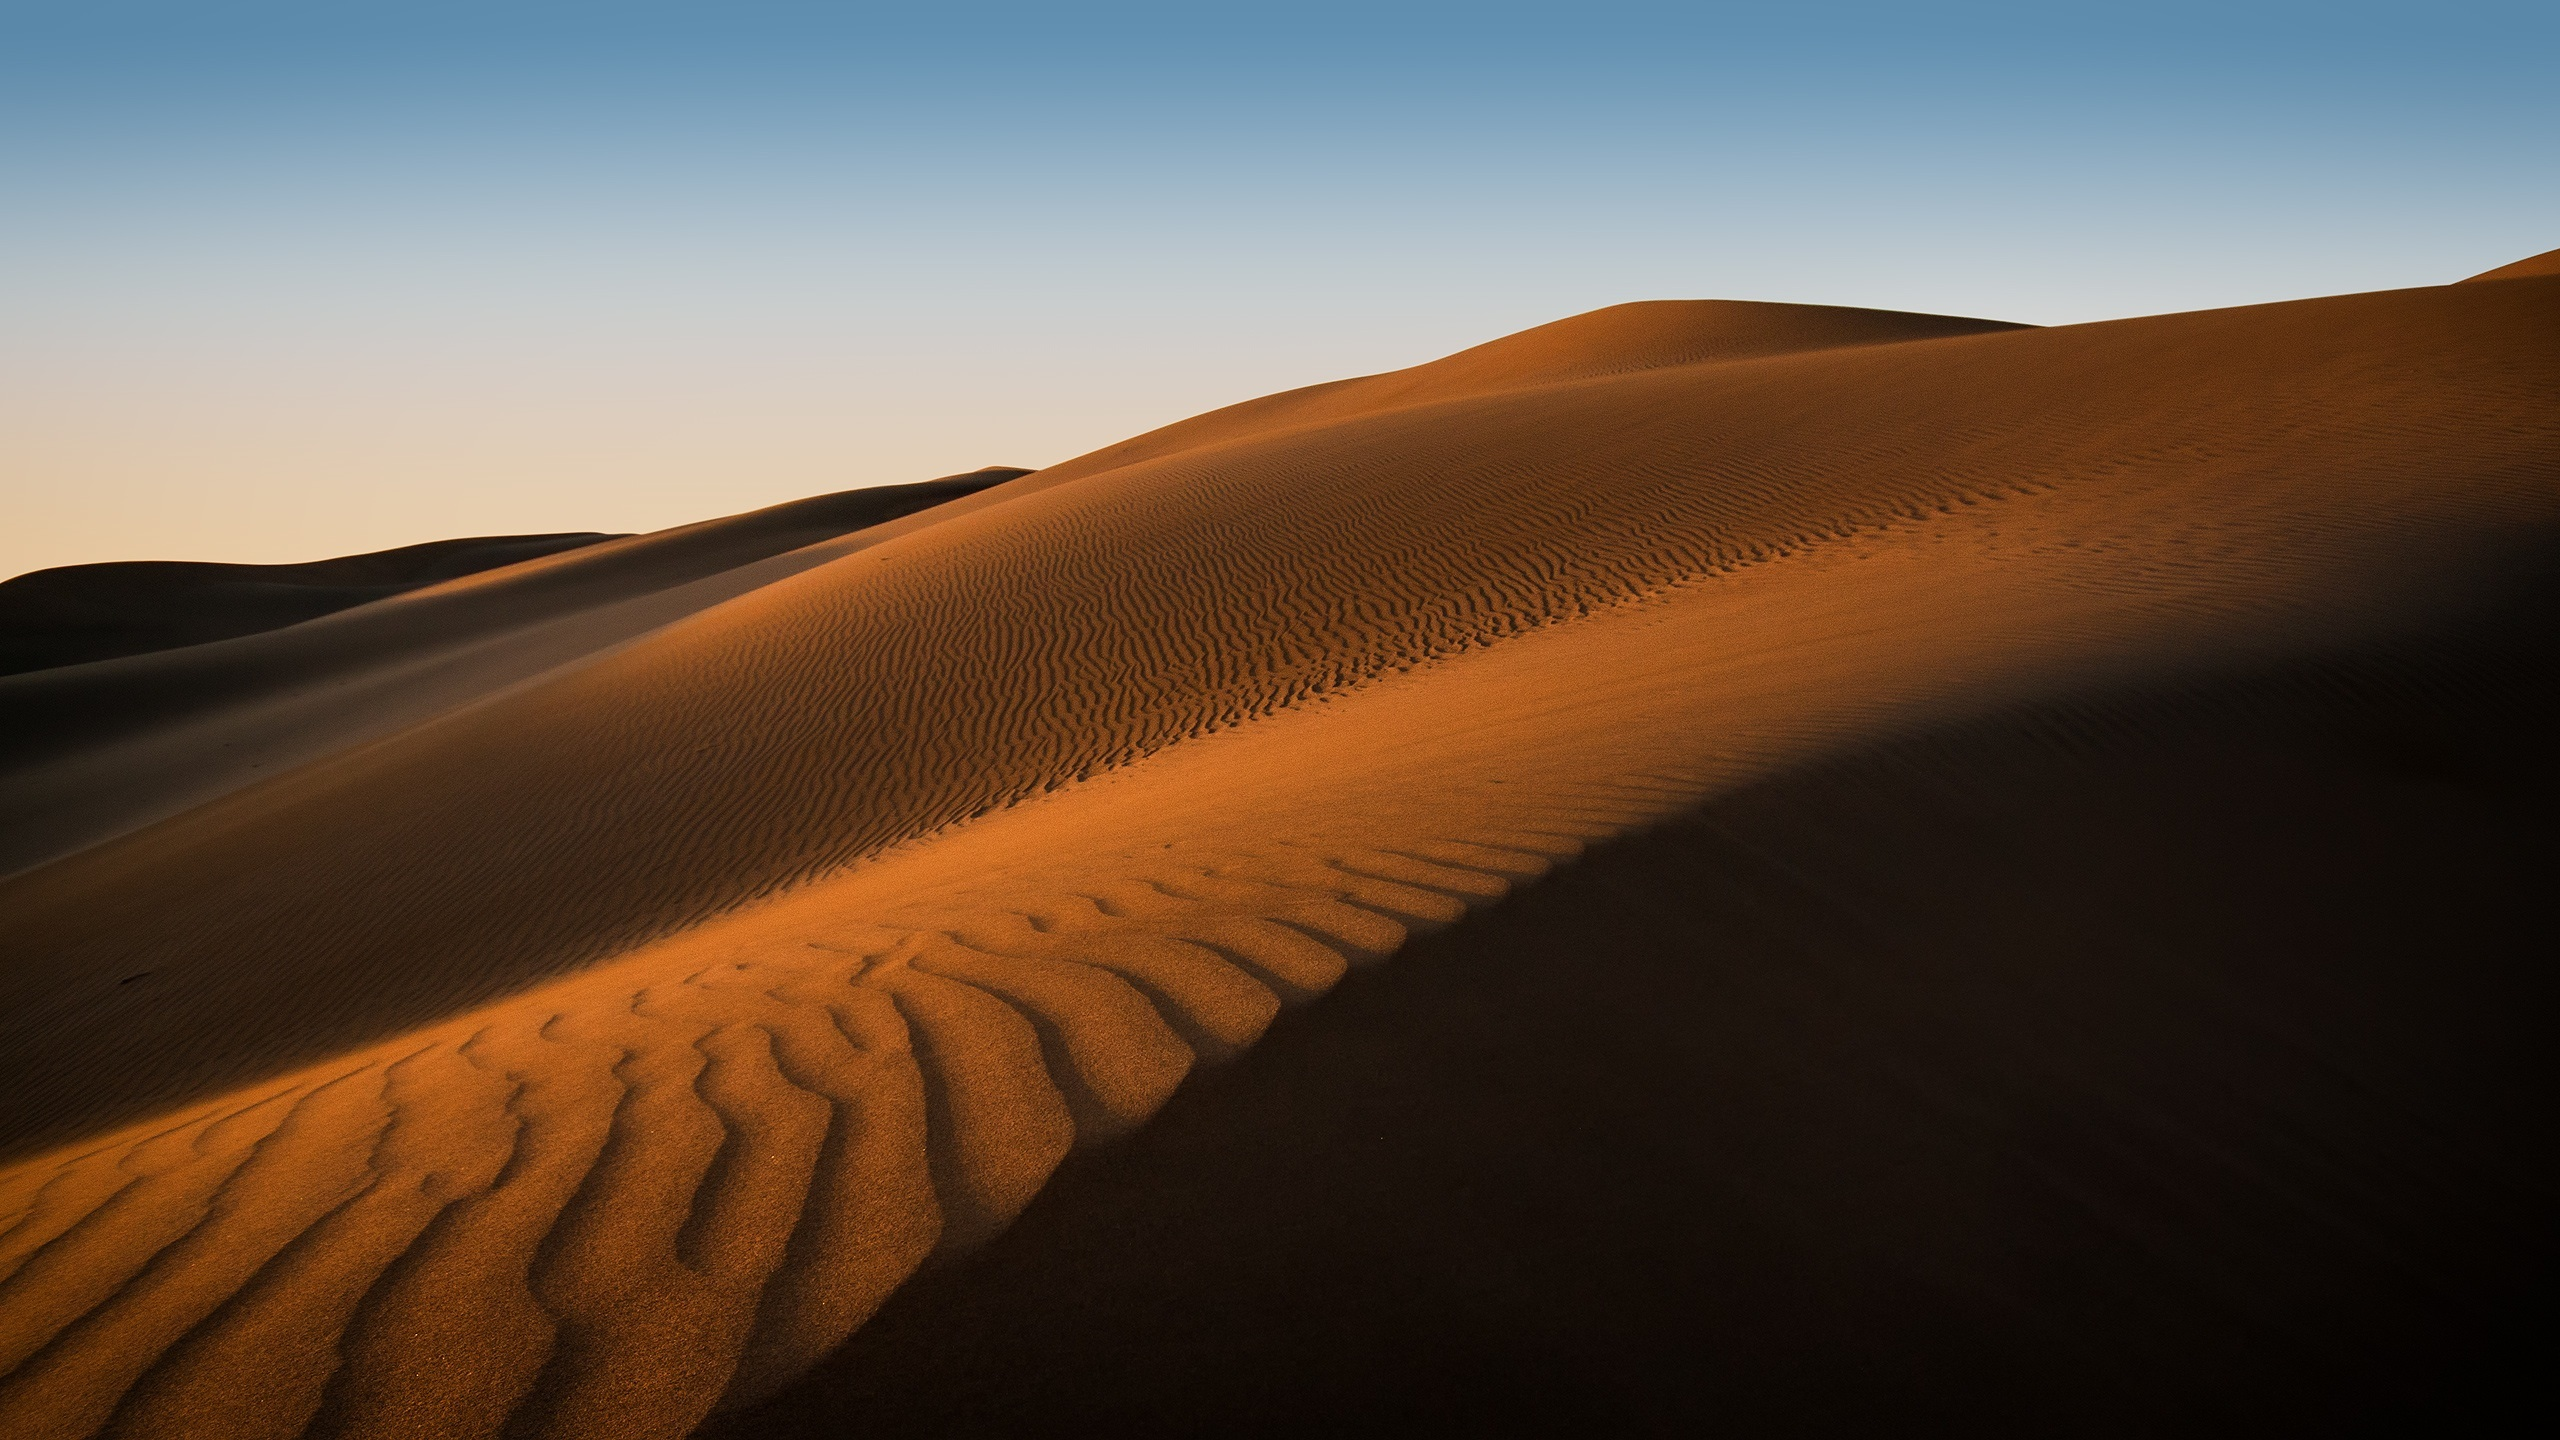 2560x1440 Wallpaper Hd Picalls Com Sand Dunes In Maspalomas Spain By Philipp